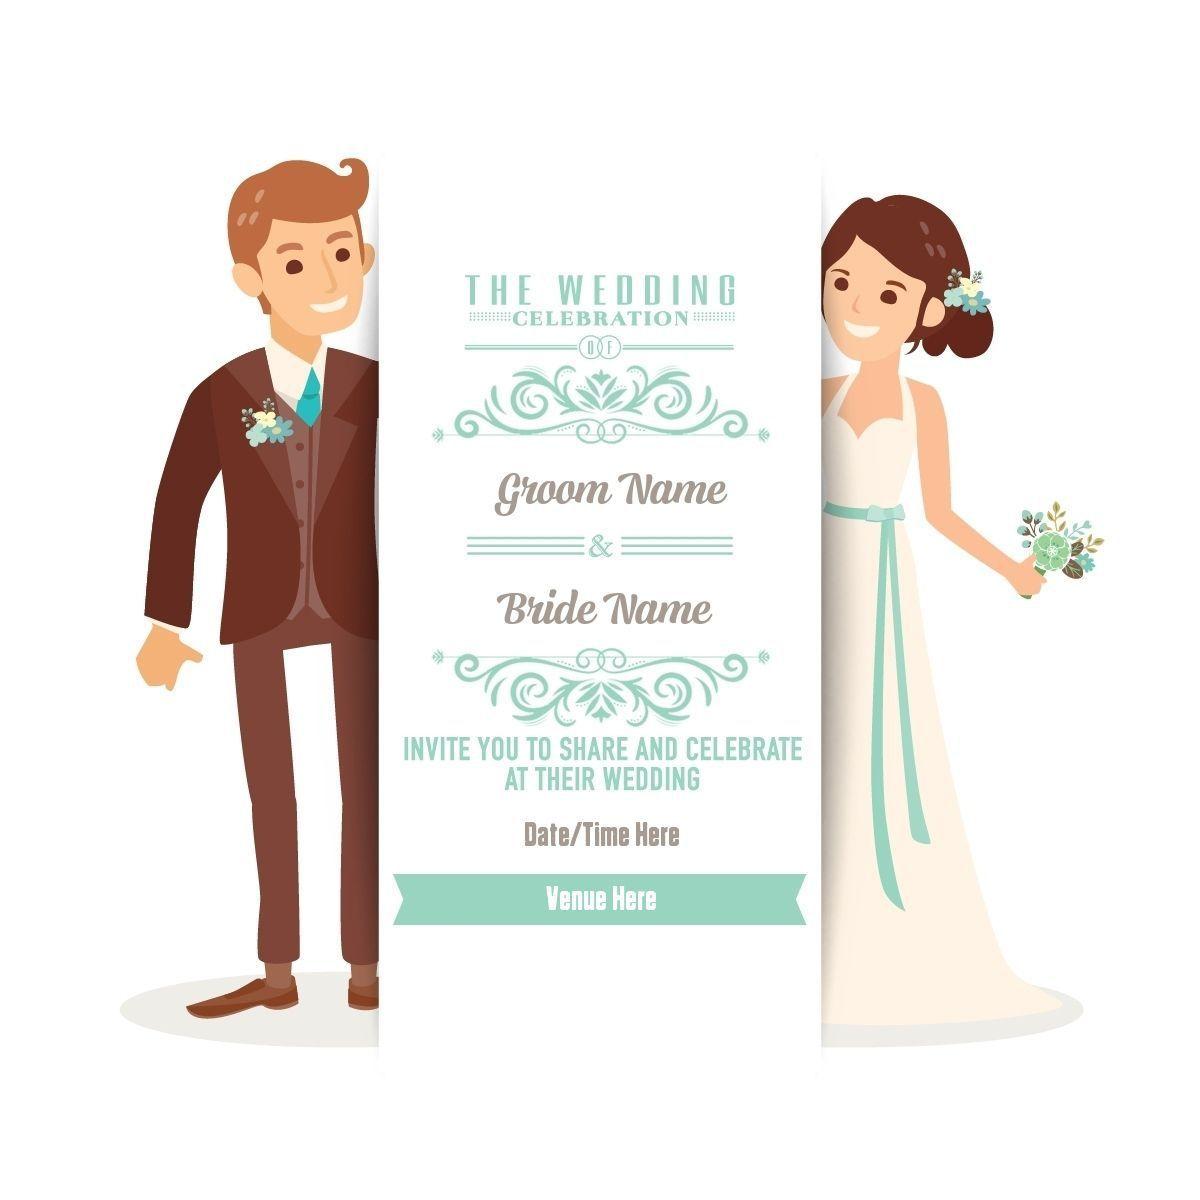 wedding invitation : wedding invitation cards online - Free ...